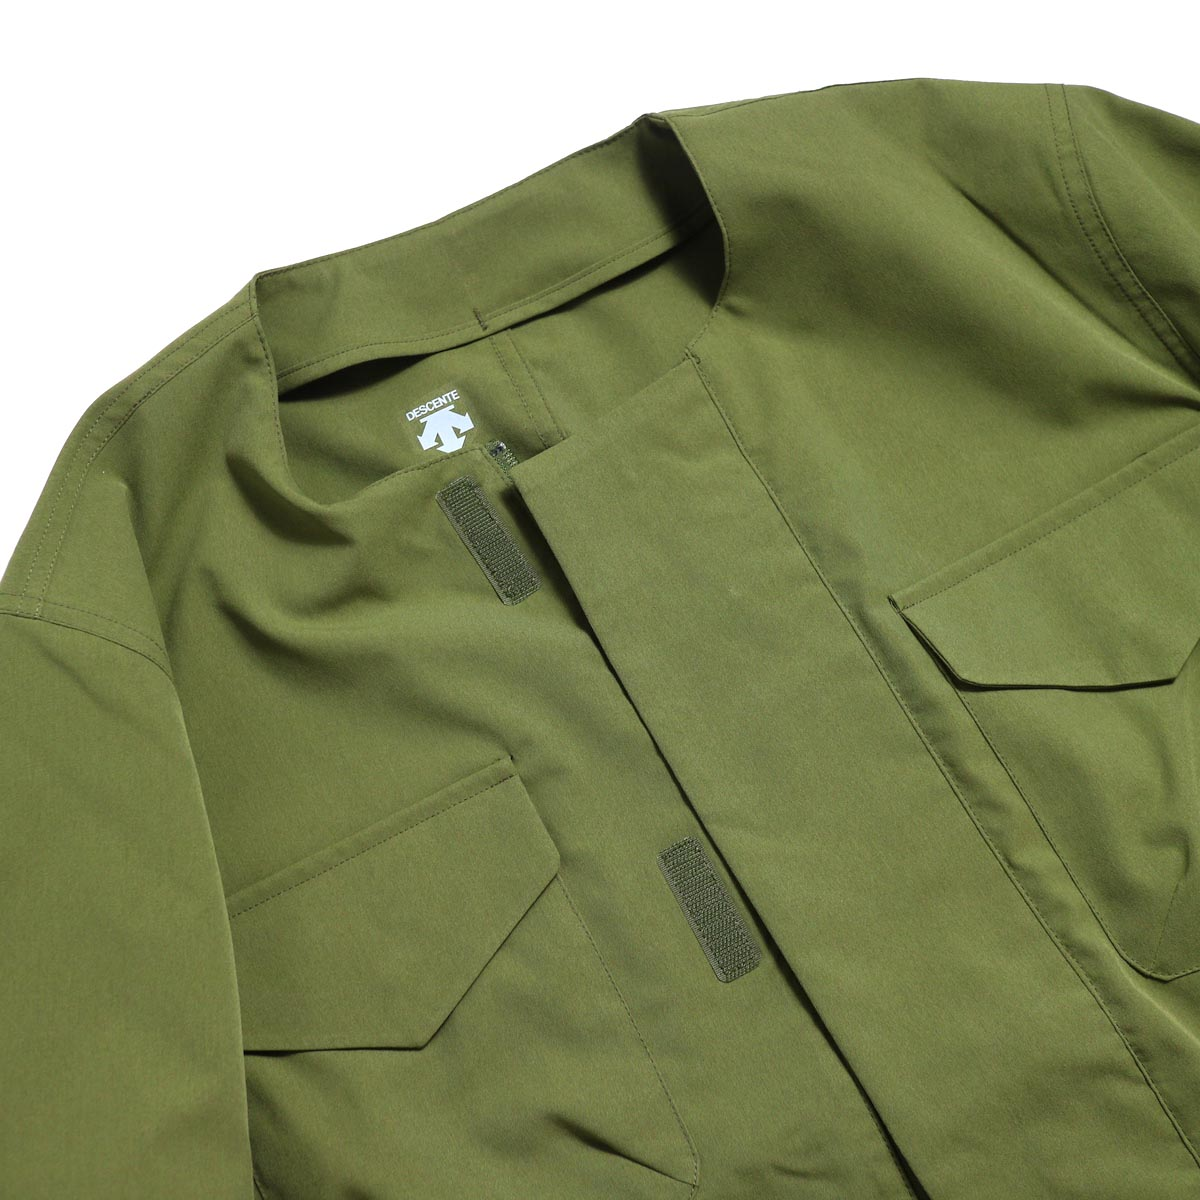 DESCENTE ddd / Utility Jacket -OLIVE ノーカラー